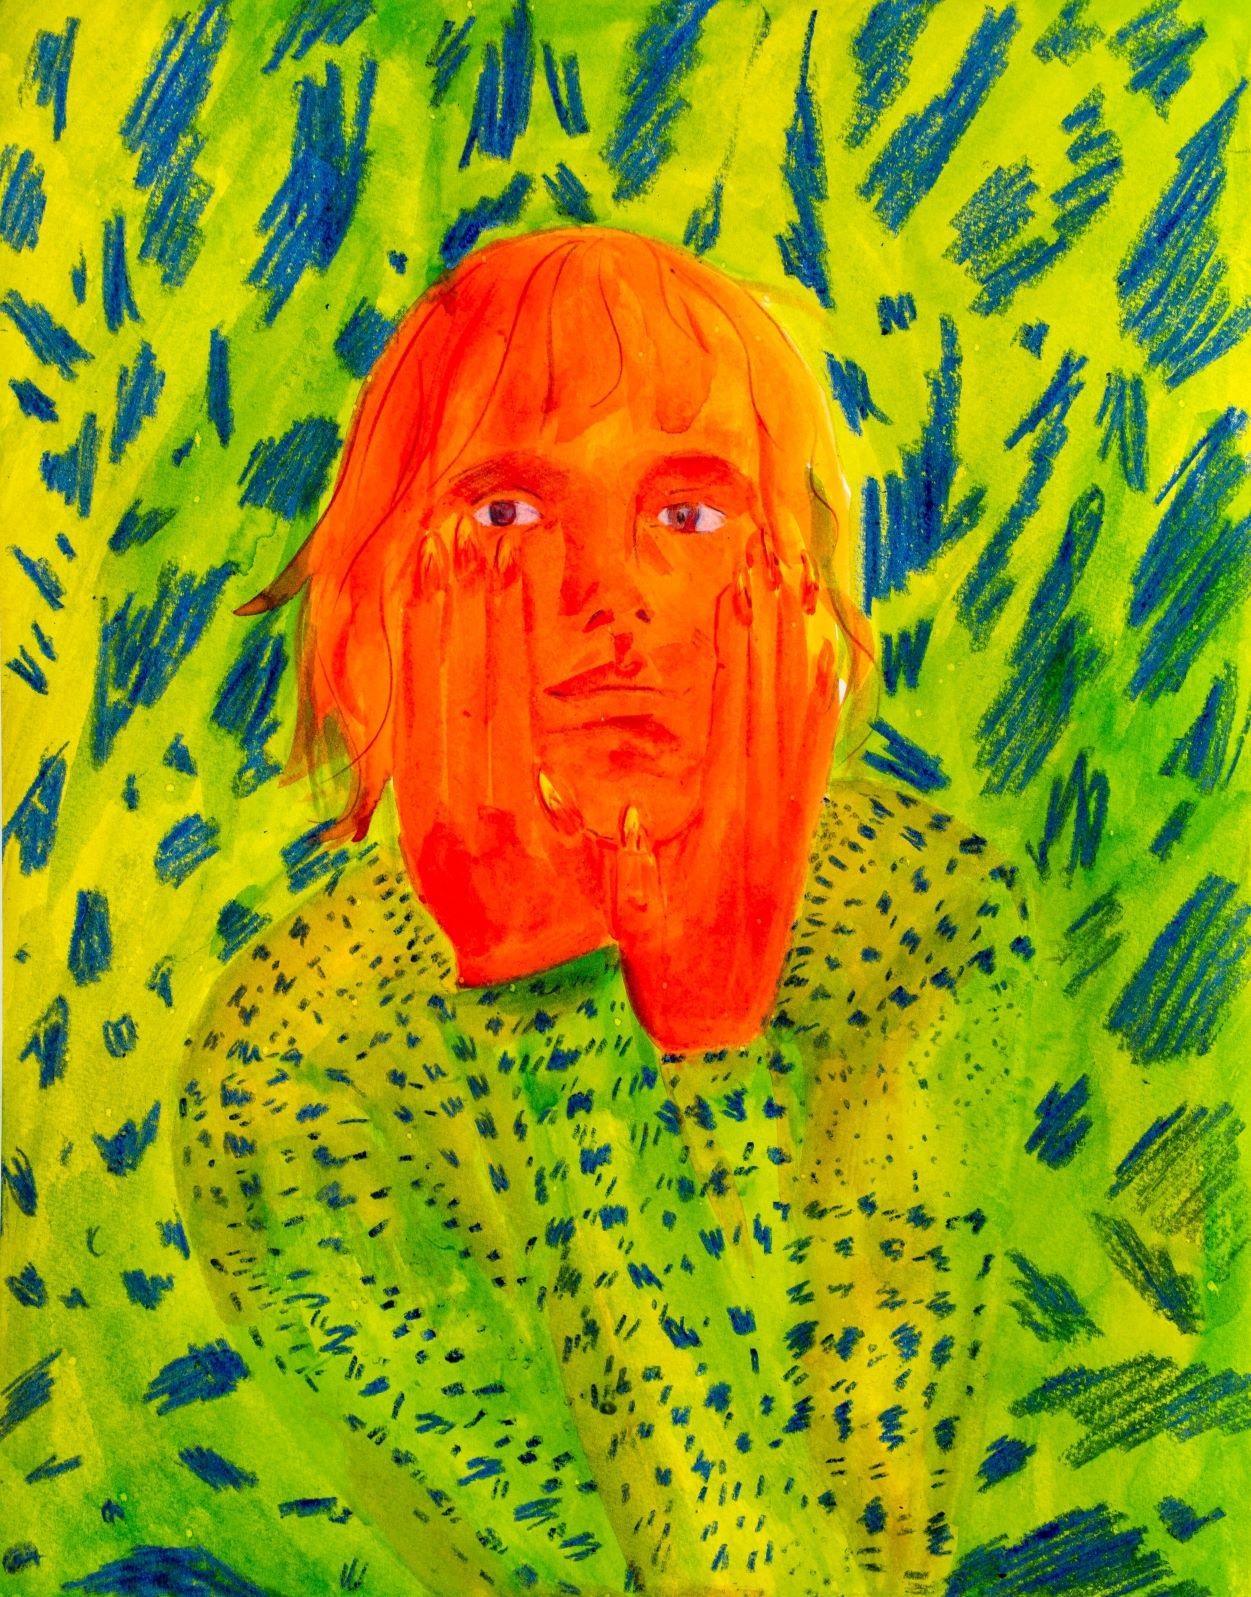 Hannah Tilson (image courtesy of the Royal Drawing School)